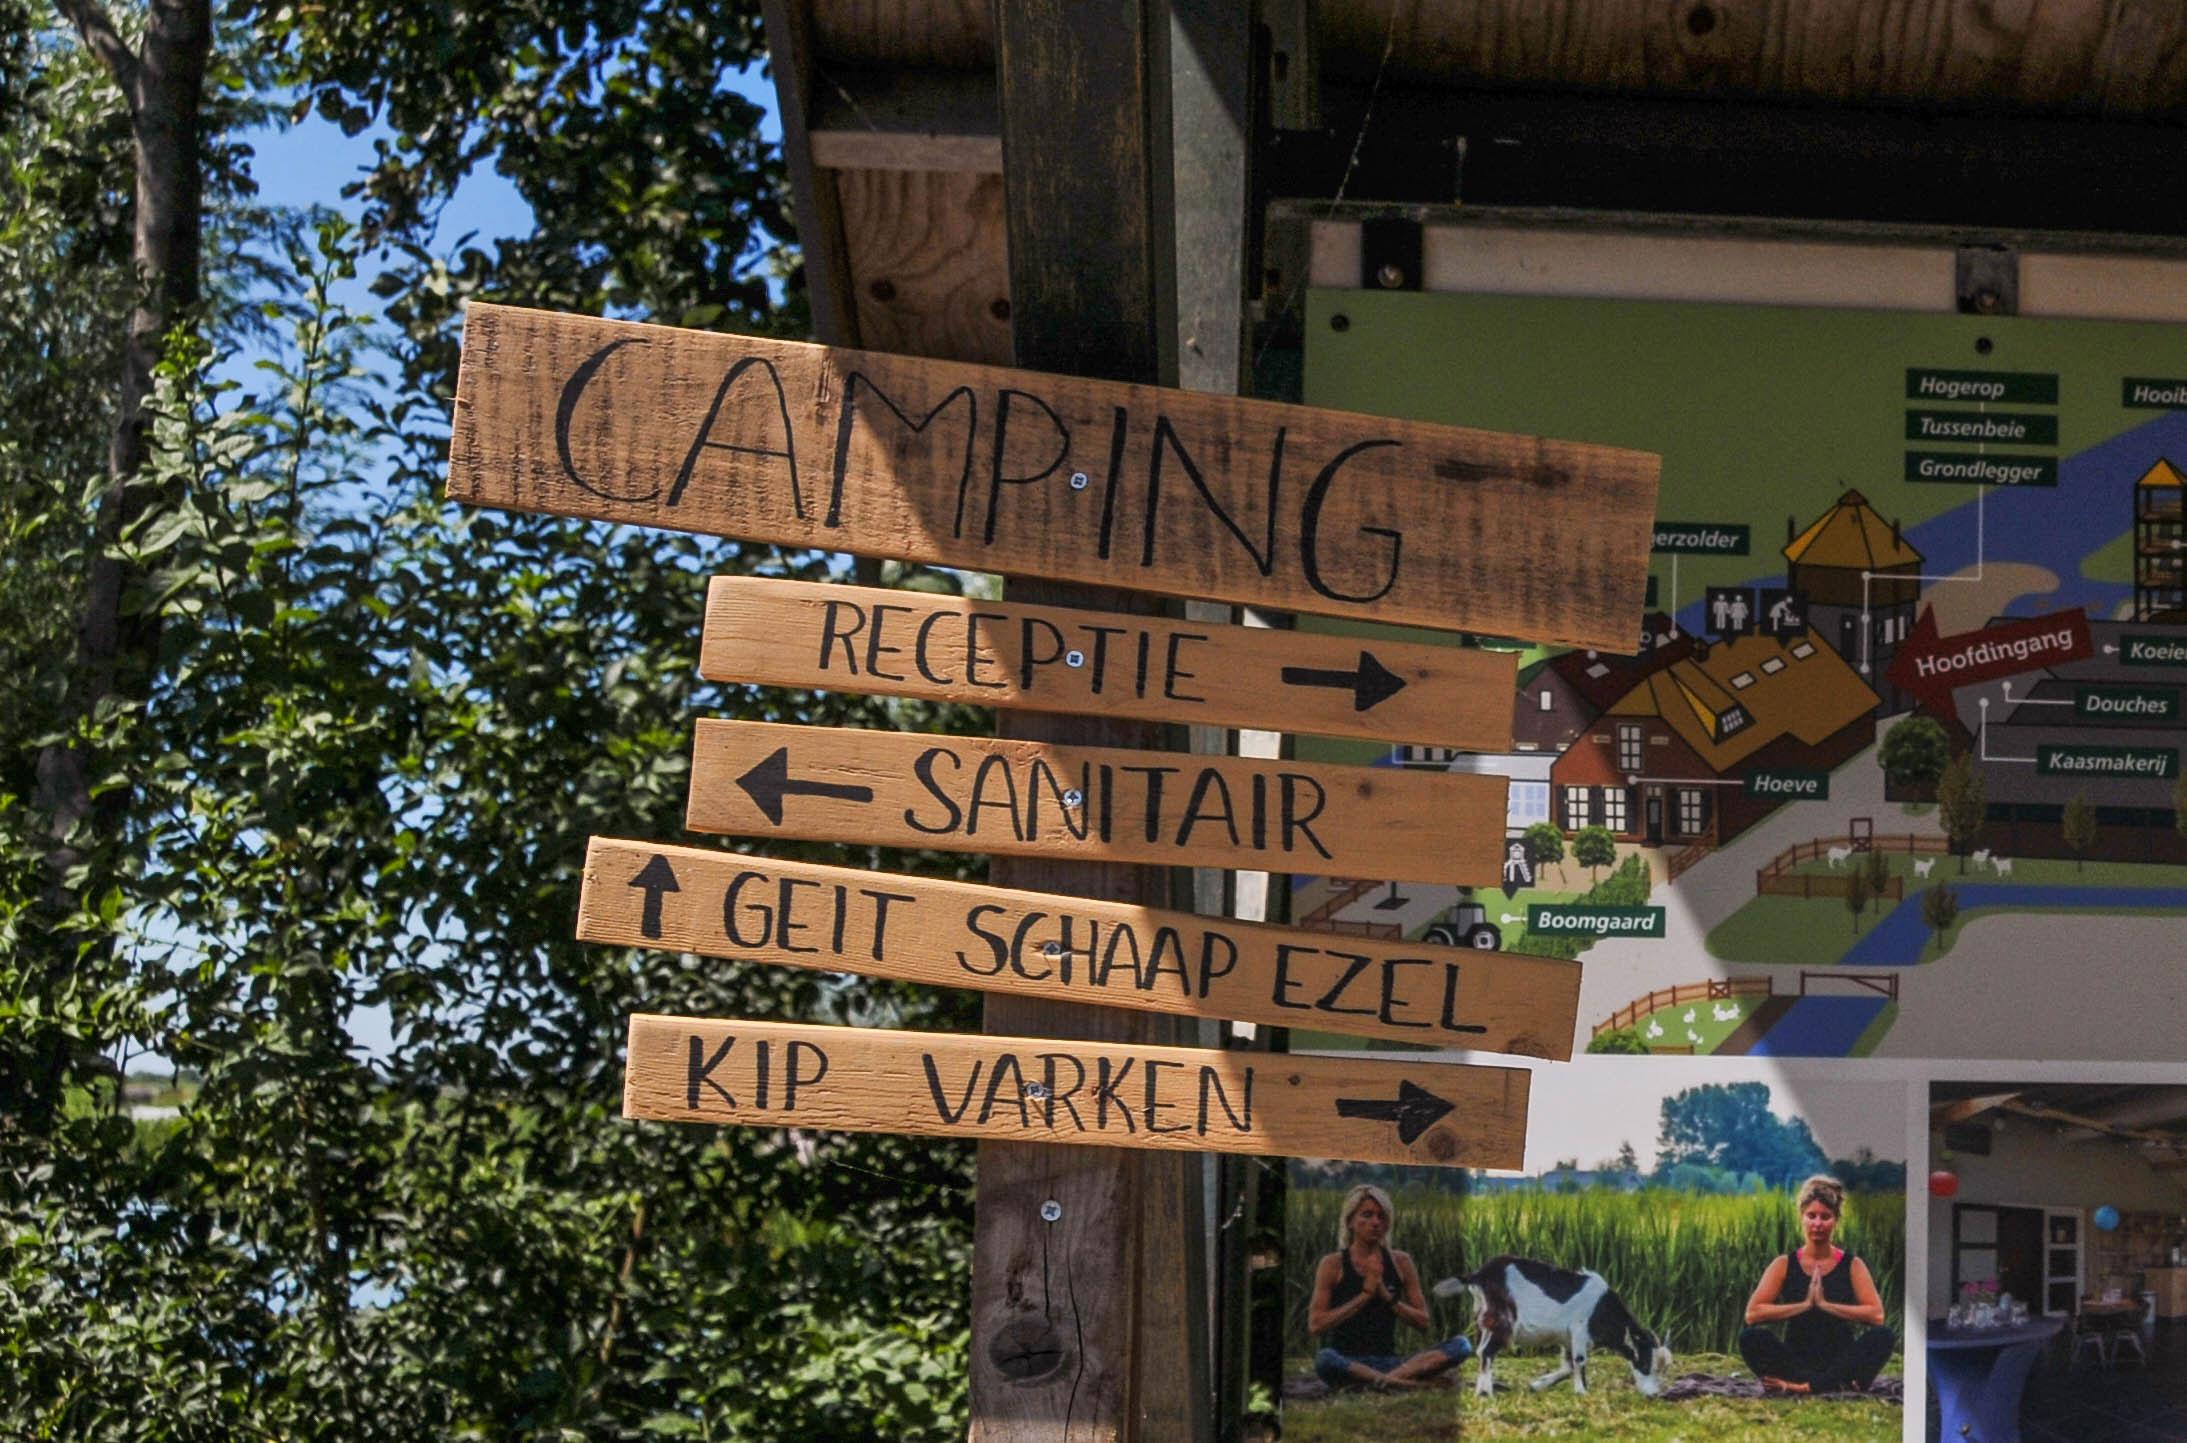 Campingbordje   Camping de Boerinn